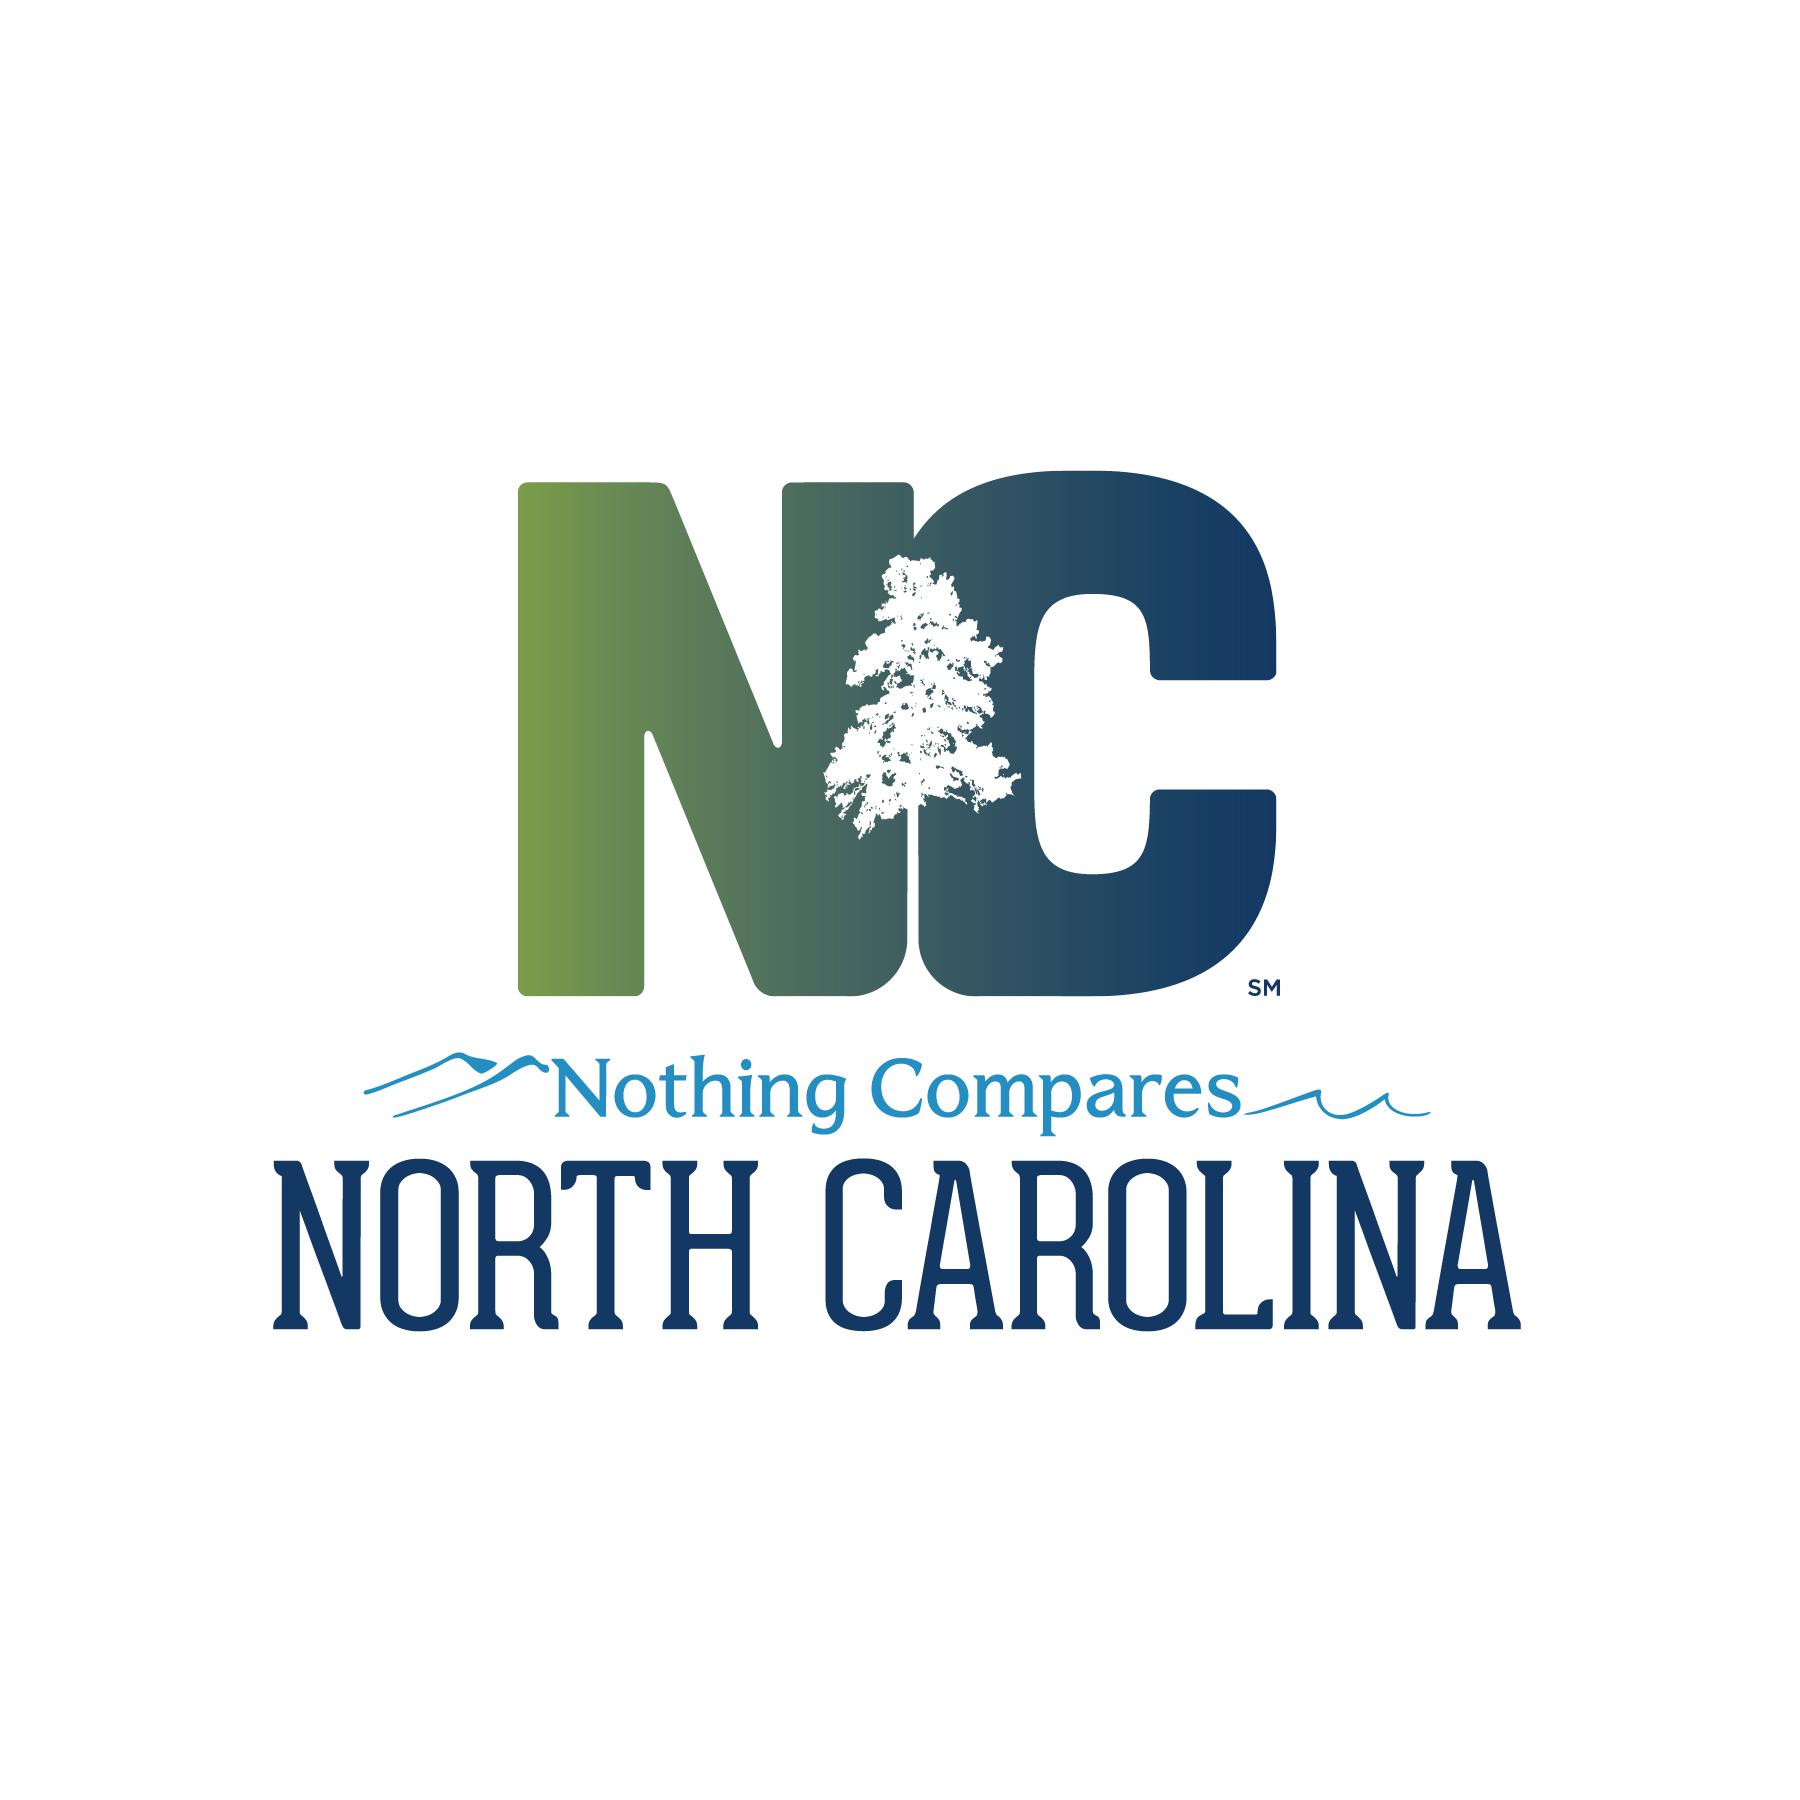 NC_Logo-01.jpg